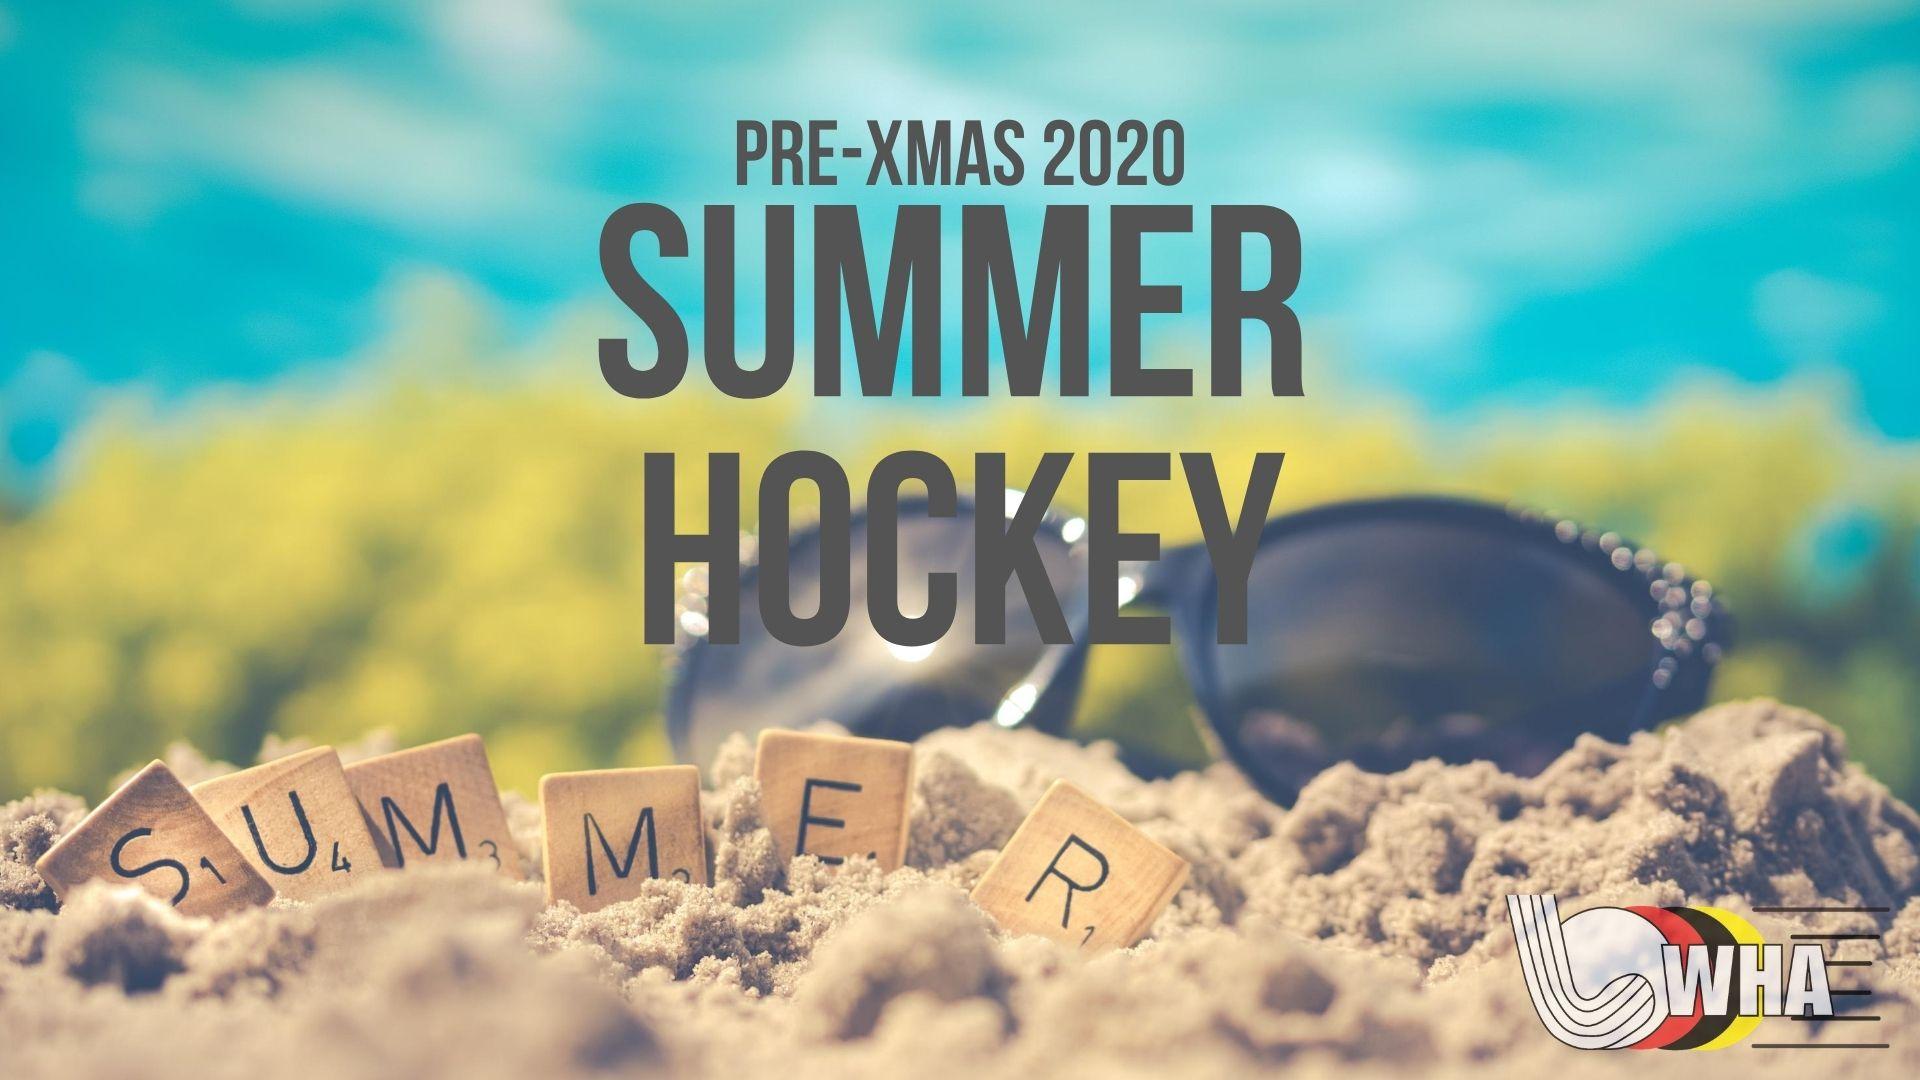 Pre-Xmas Summer Hockey 2020